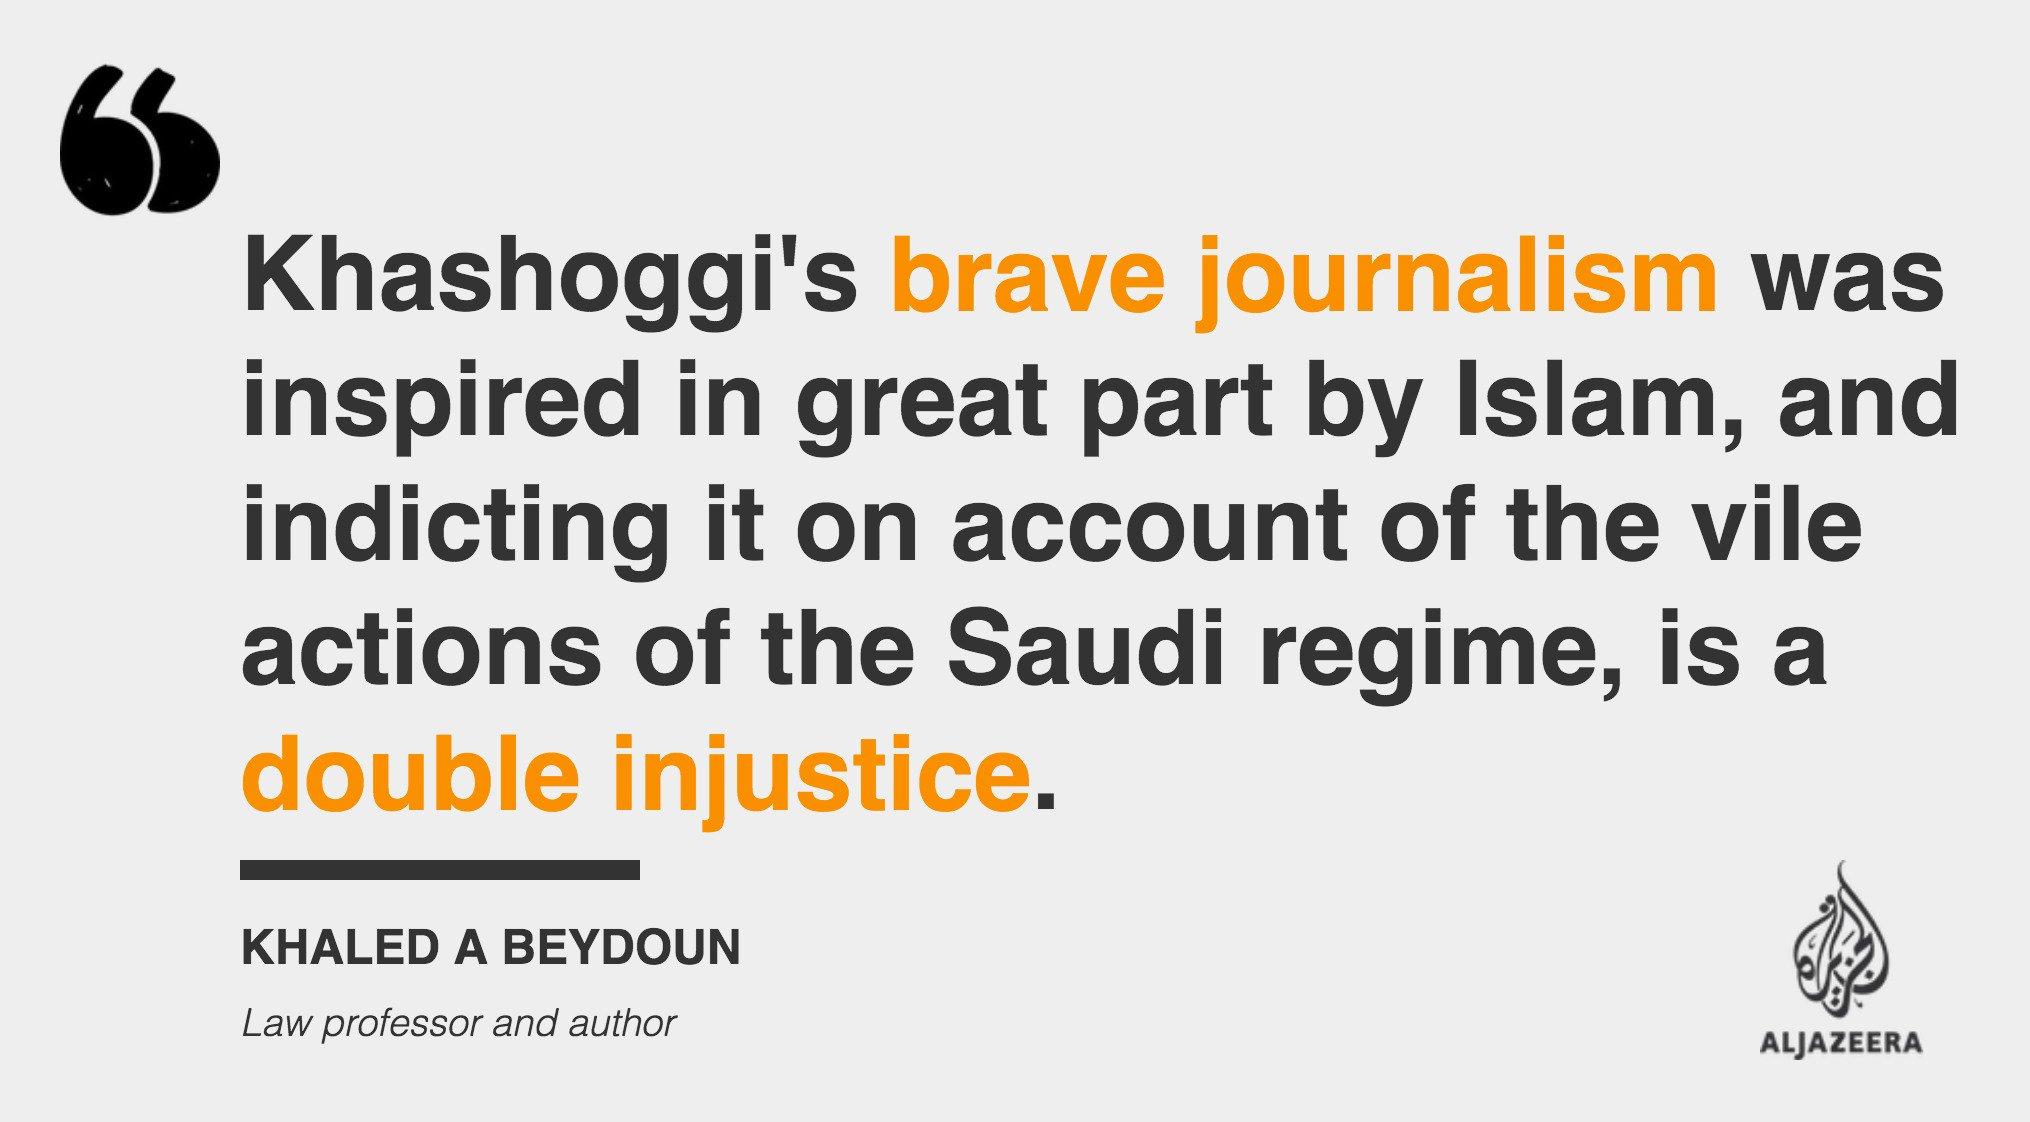 The Saudi regime does not represent Islam https://t.co/DDhJRpGO7u — #AJOpinion https://t.co/I4bjkqIybT